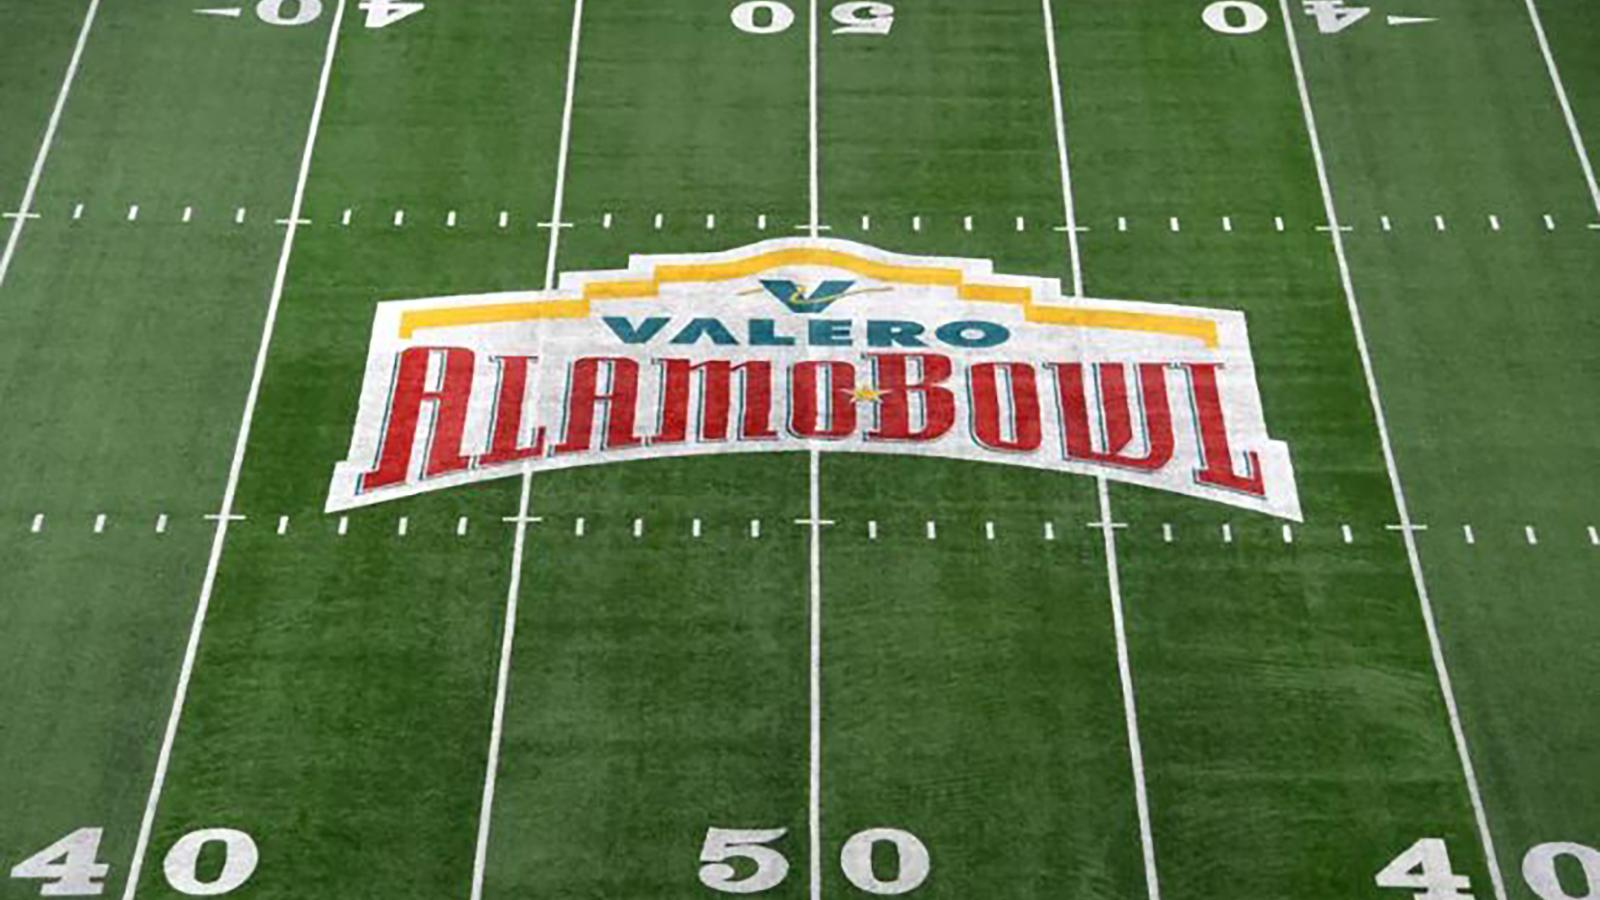 Valero Alamo Bowl: Utah vs Texas